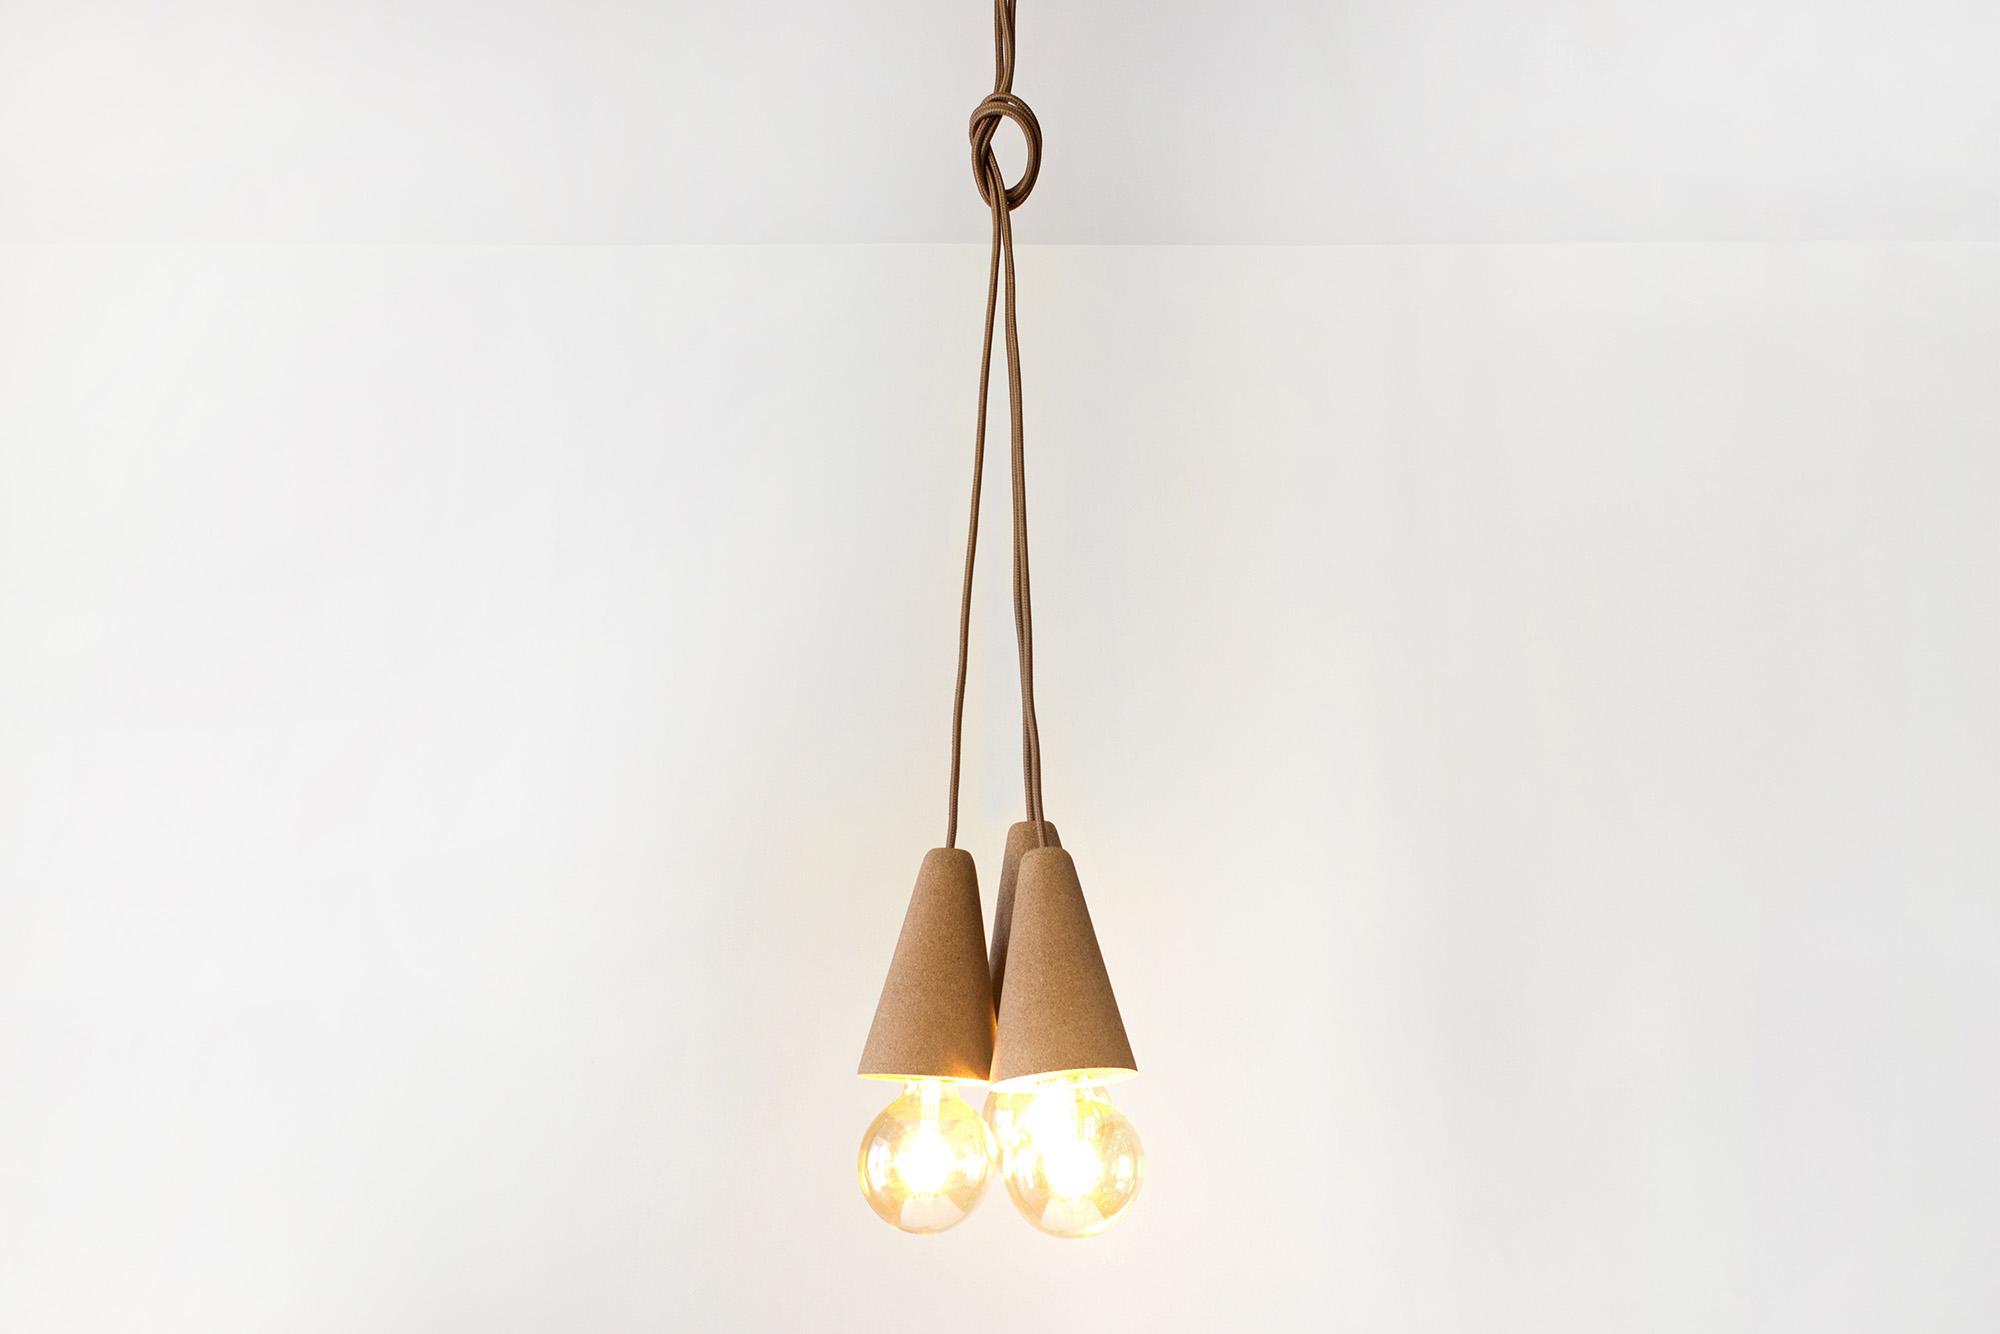 low-Galula-Sino-lamp-light-cork-triple-amb-2.jpg